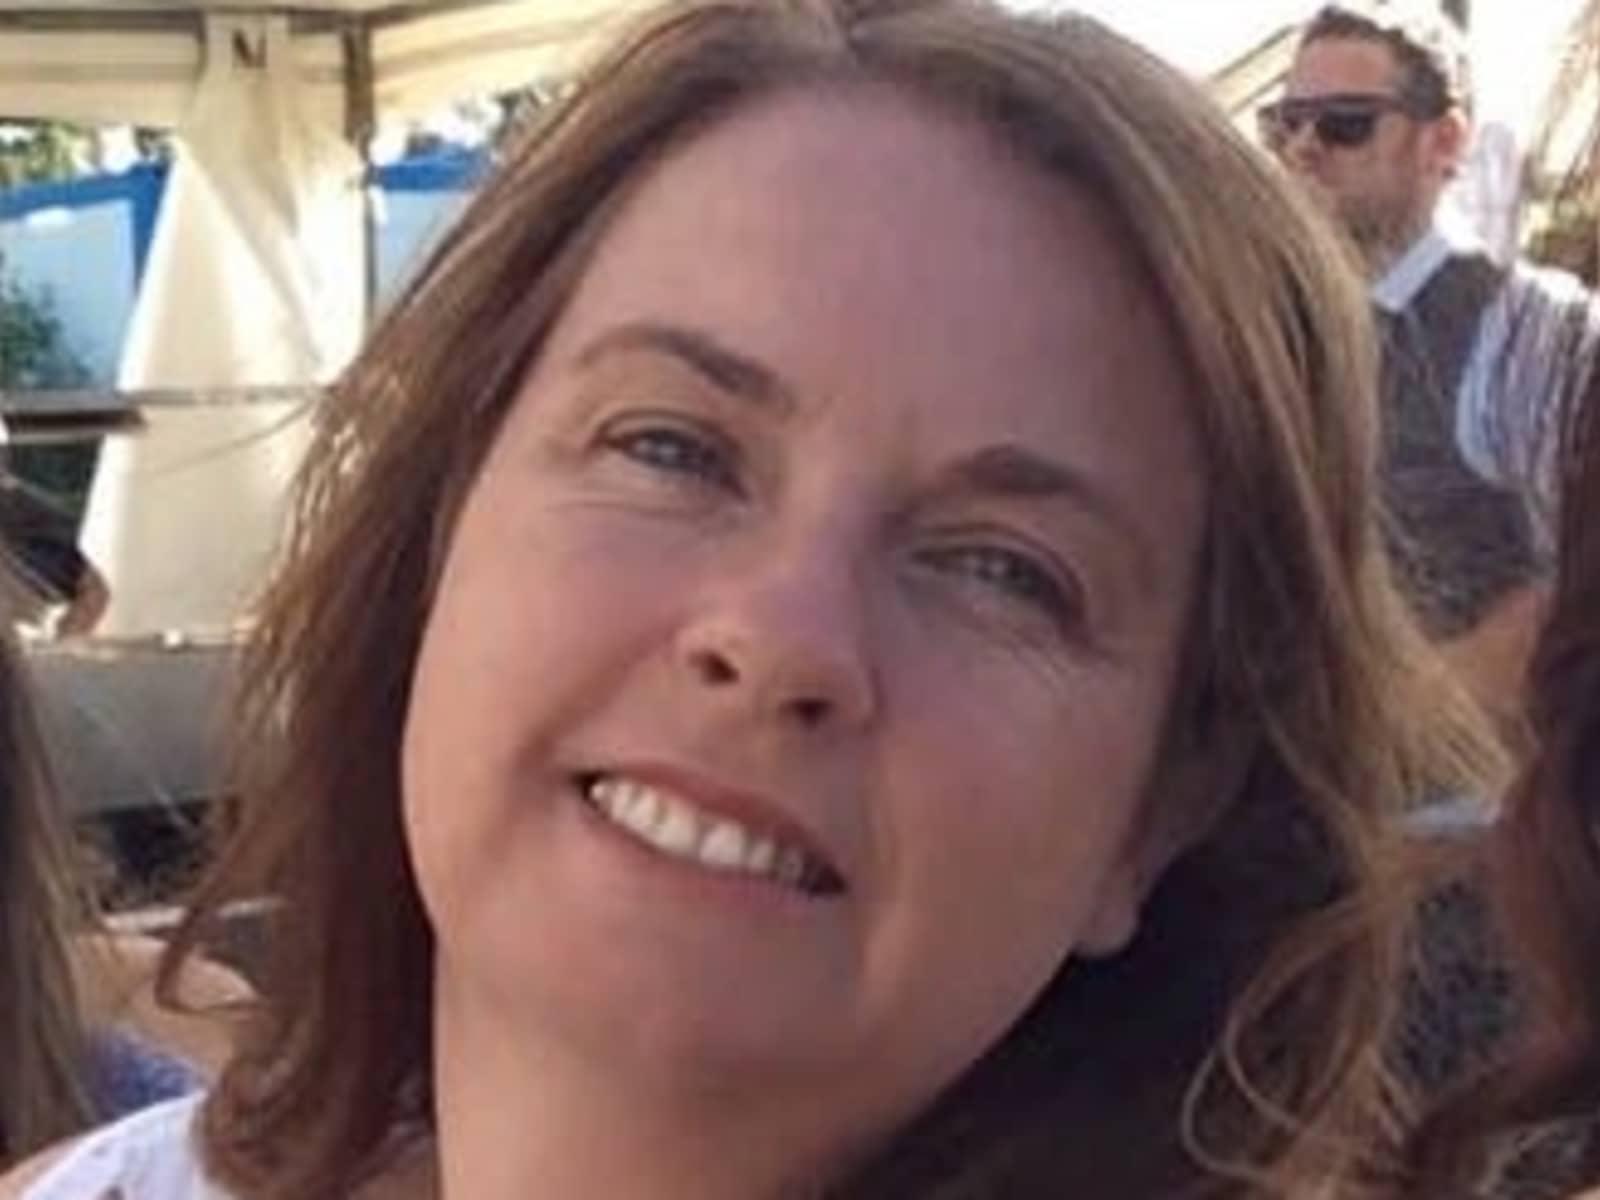 Margaret from Perth, Western Australia, Australia